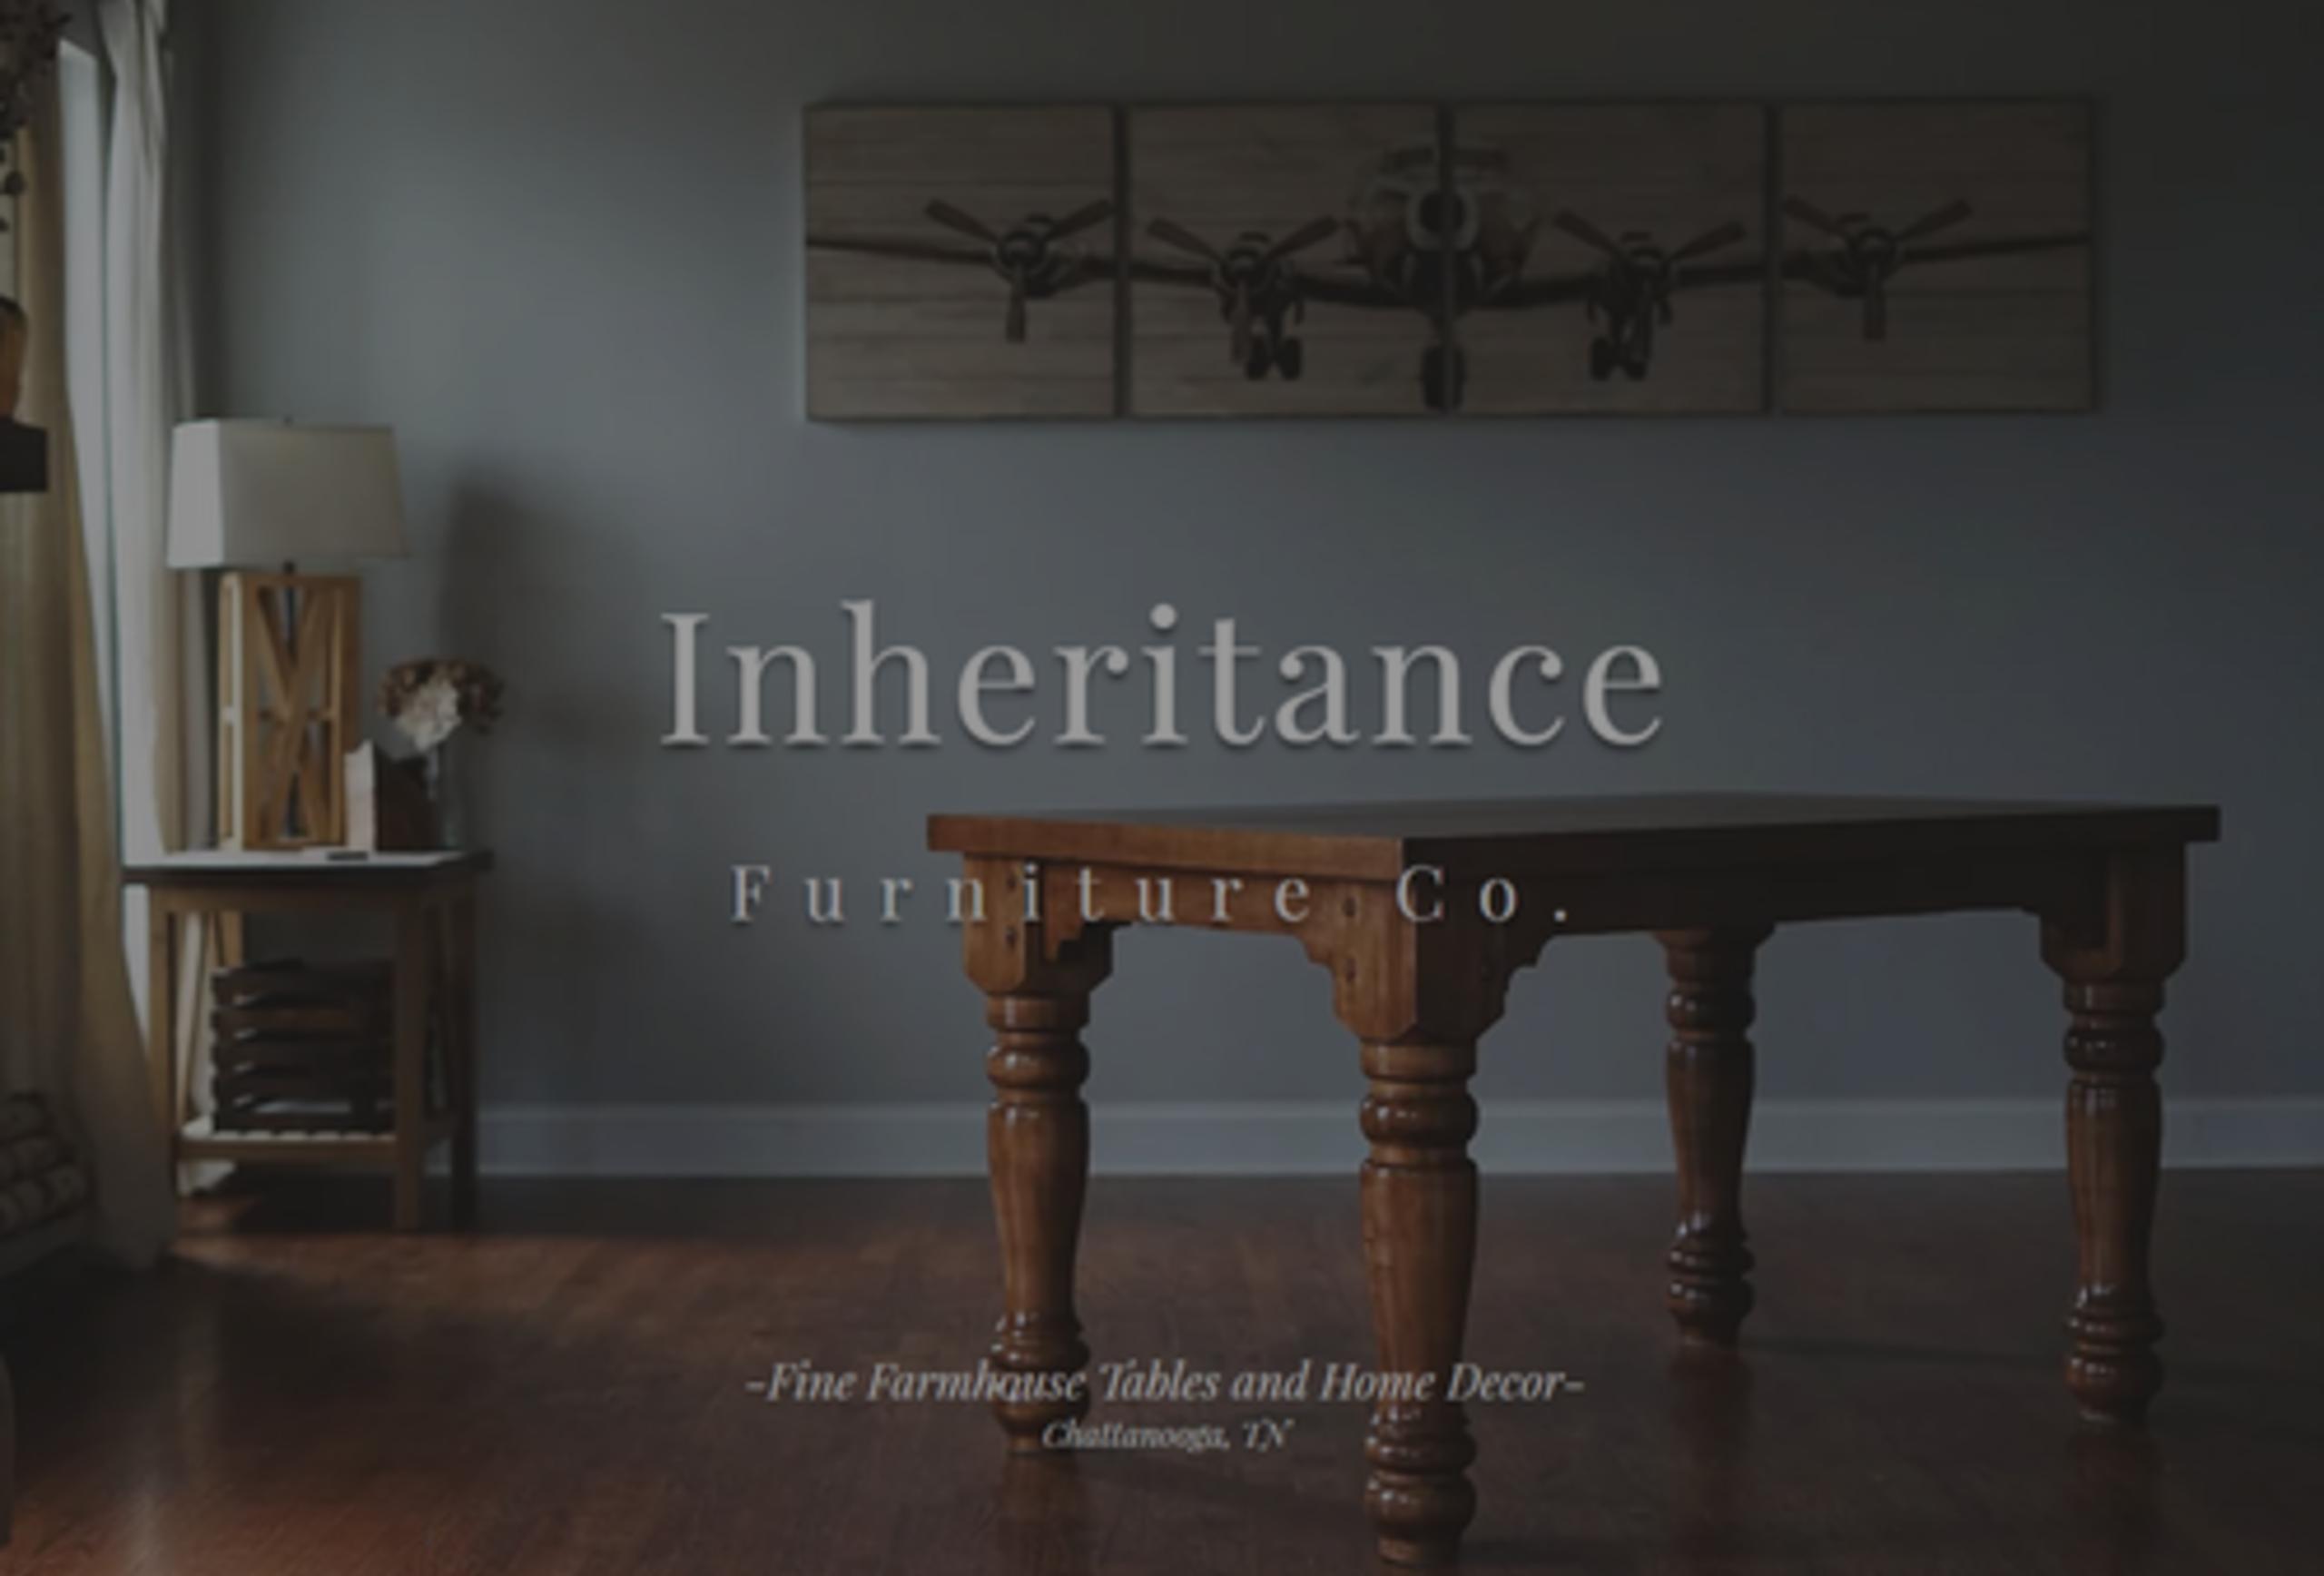 Inheritance Furniture Co. Spotlight